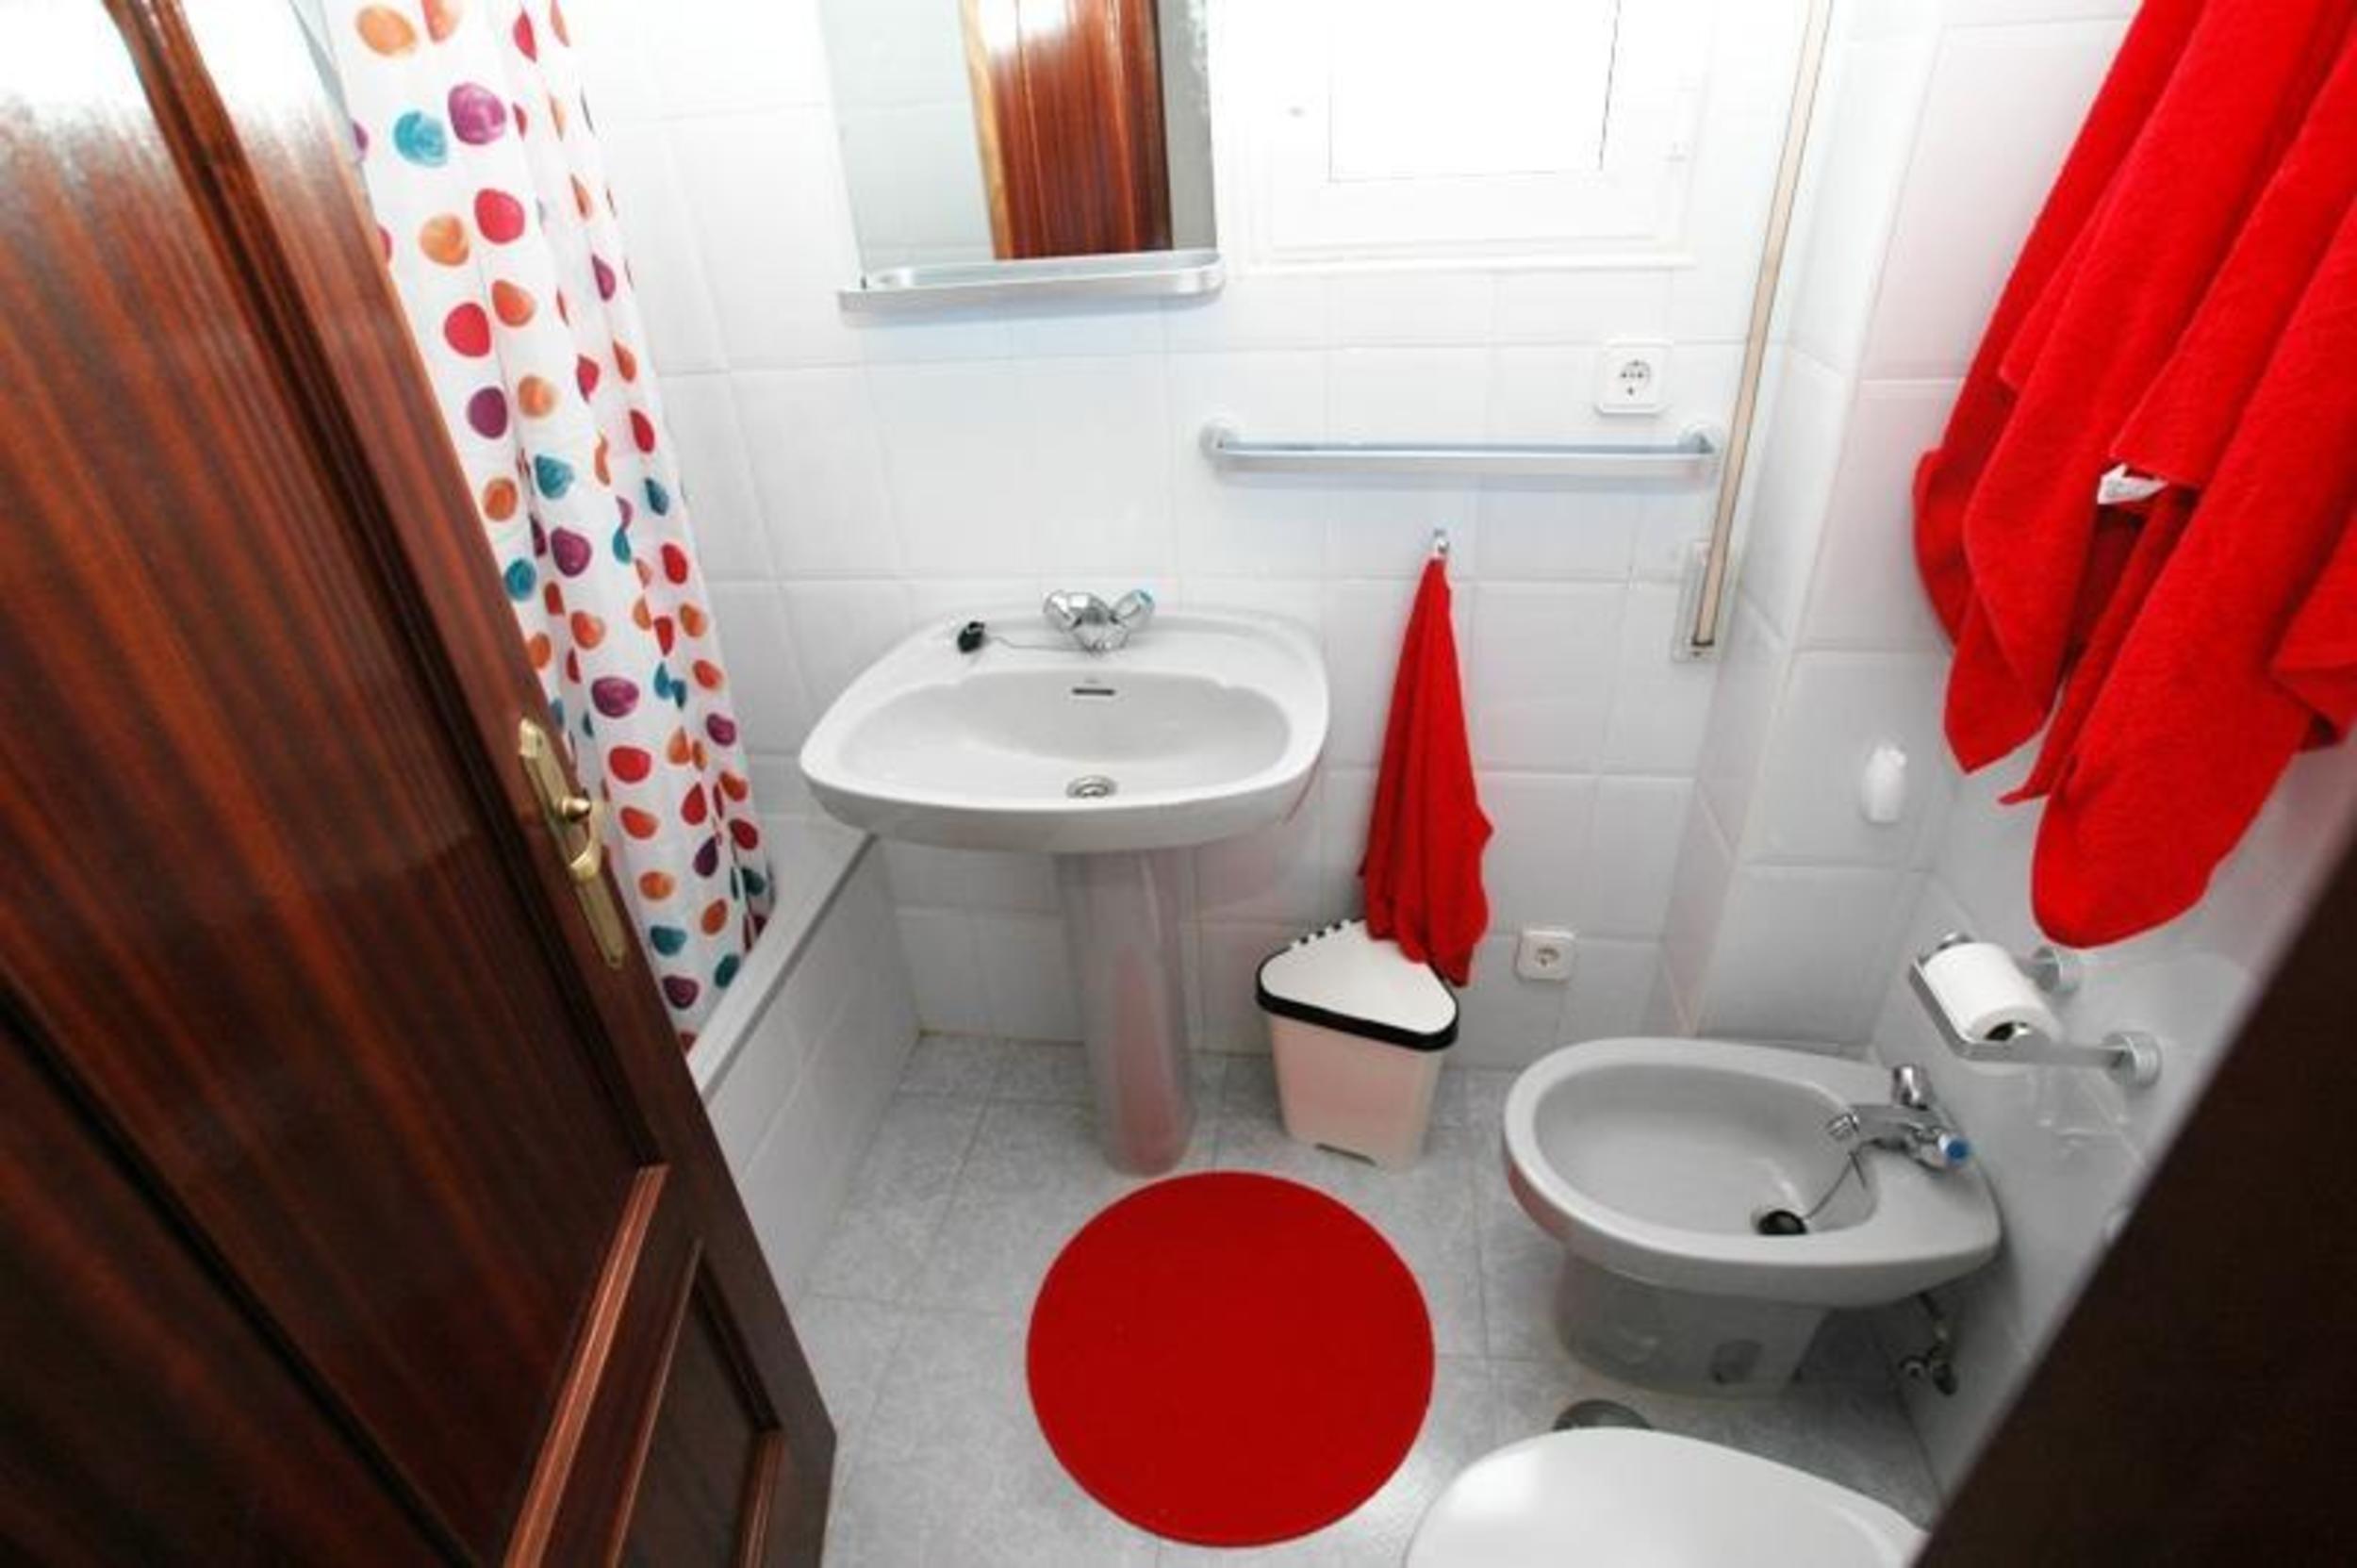 Ferienwohnung Apartment - 2 Bedrooms with Pool and Sea views - 102775 (2360880), Isla, Costa de Cantabria, Kantabrien, Spanien, Bild 7